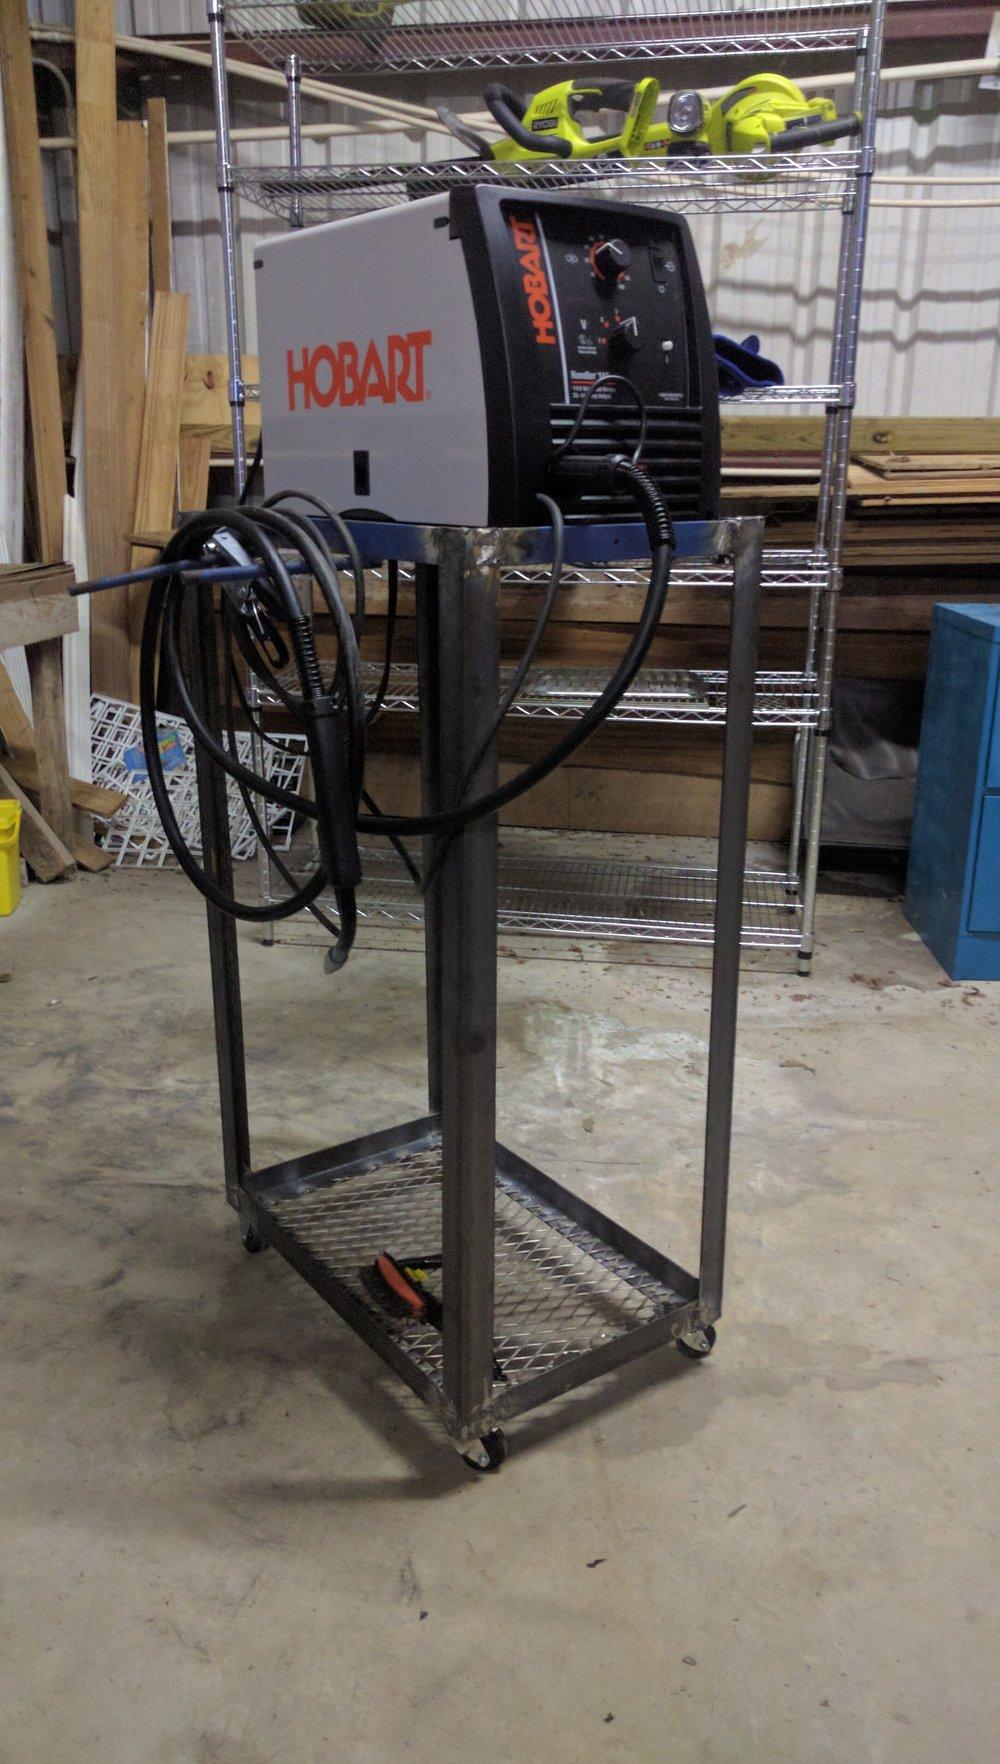 Welding machine cart.